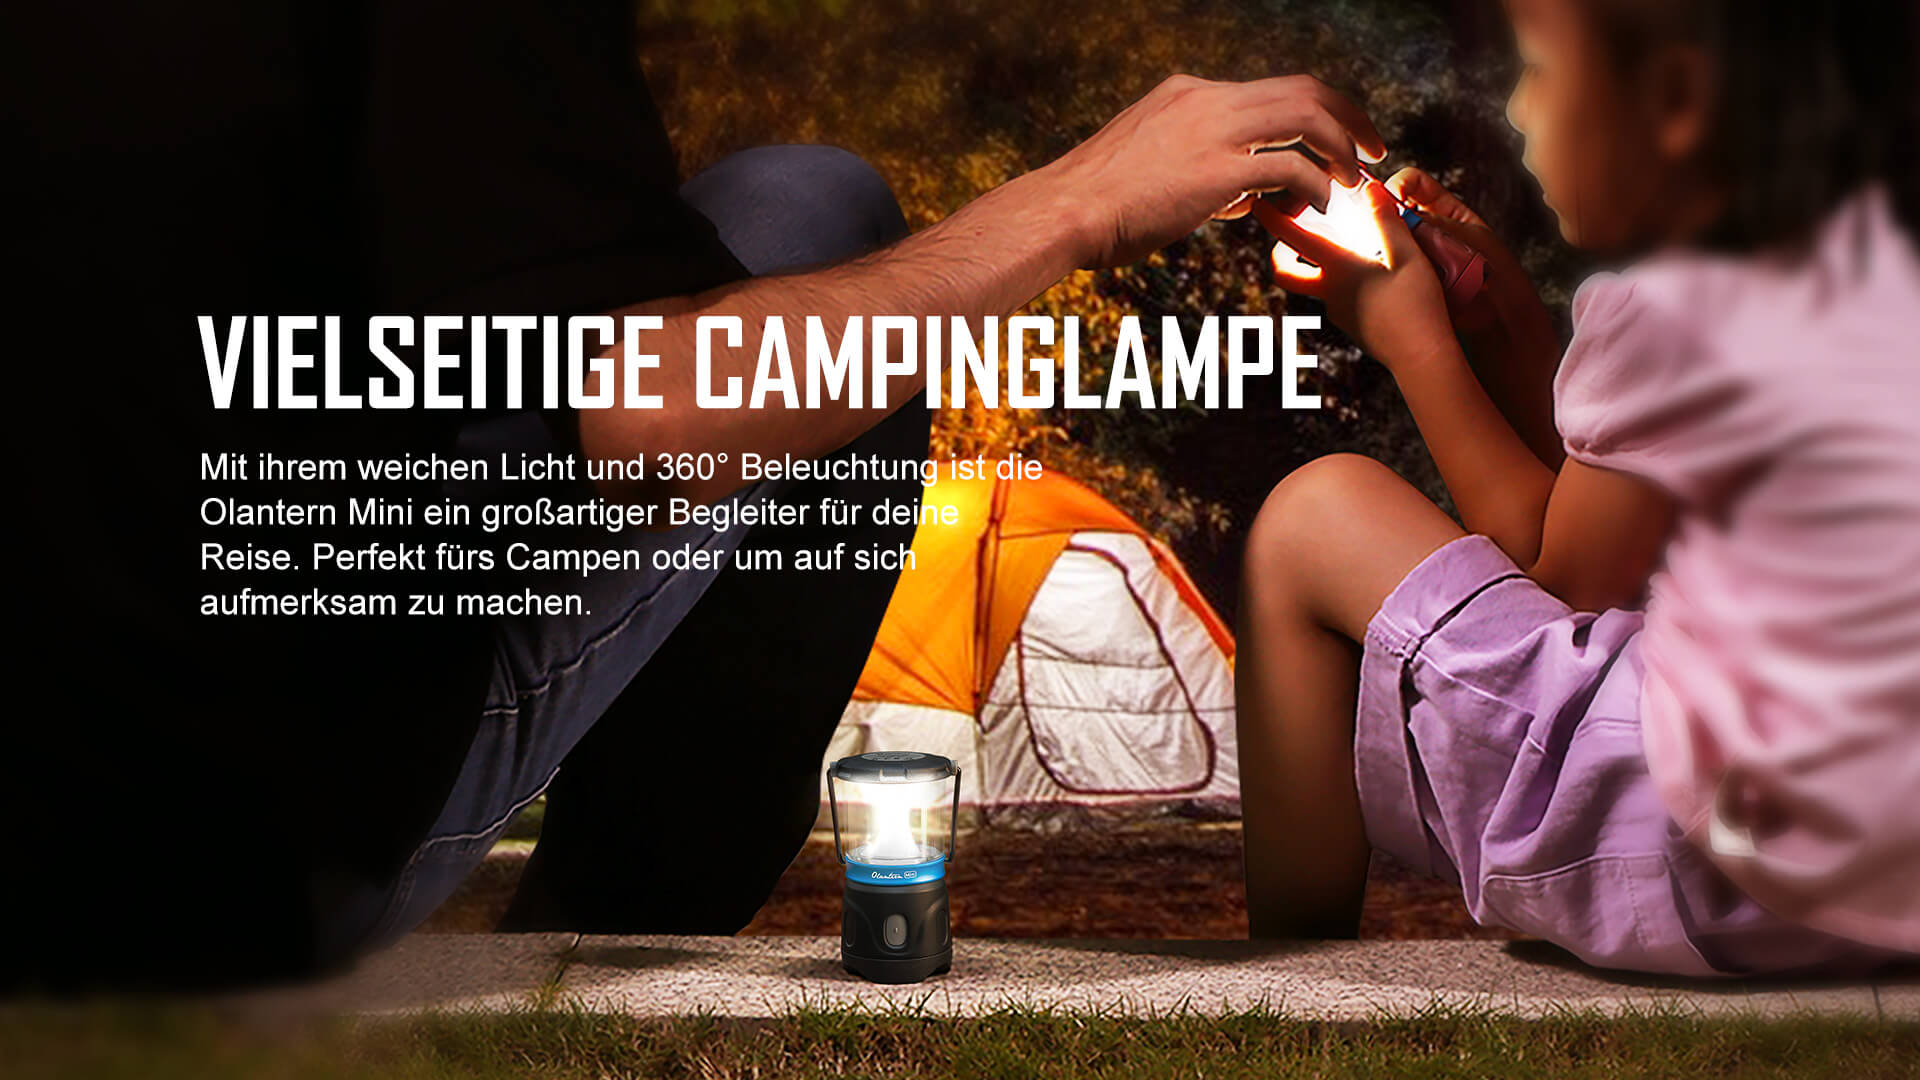 Vielseitige Campinglampe